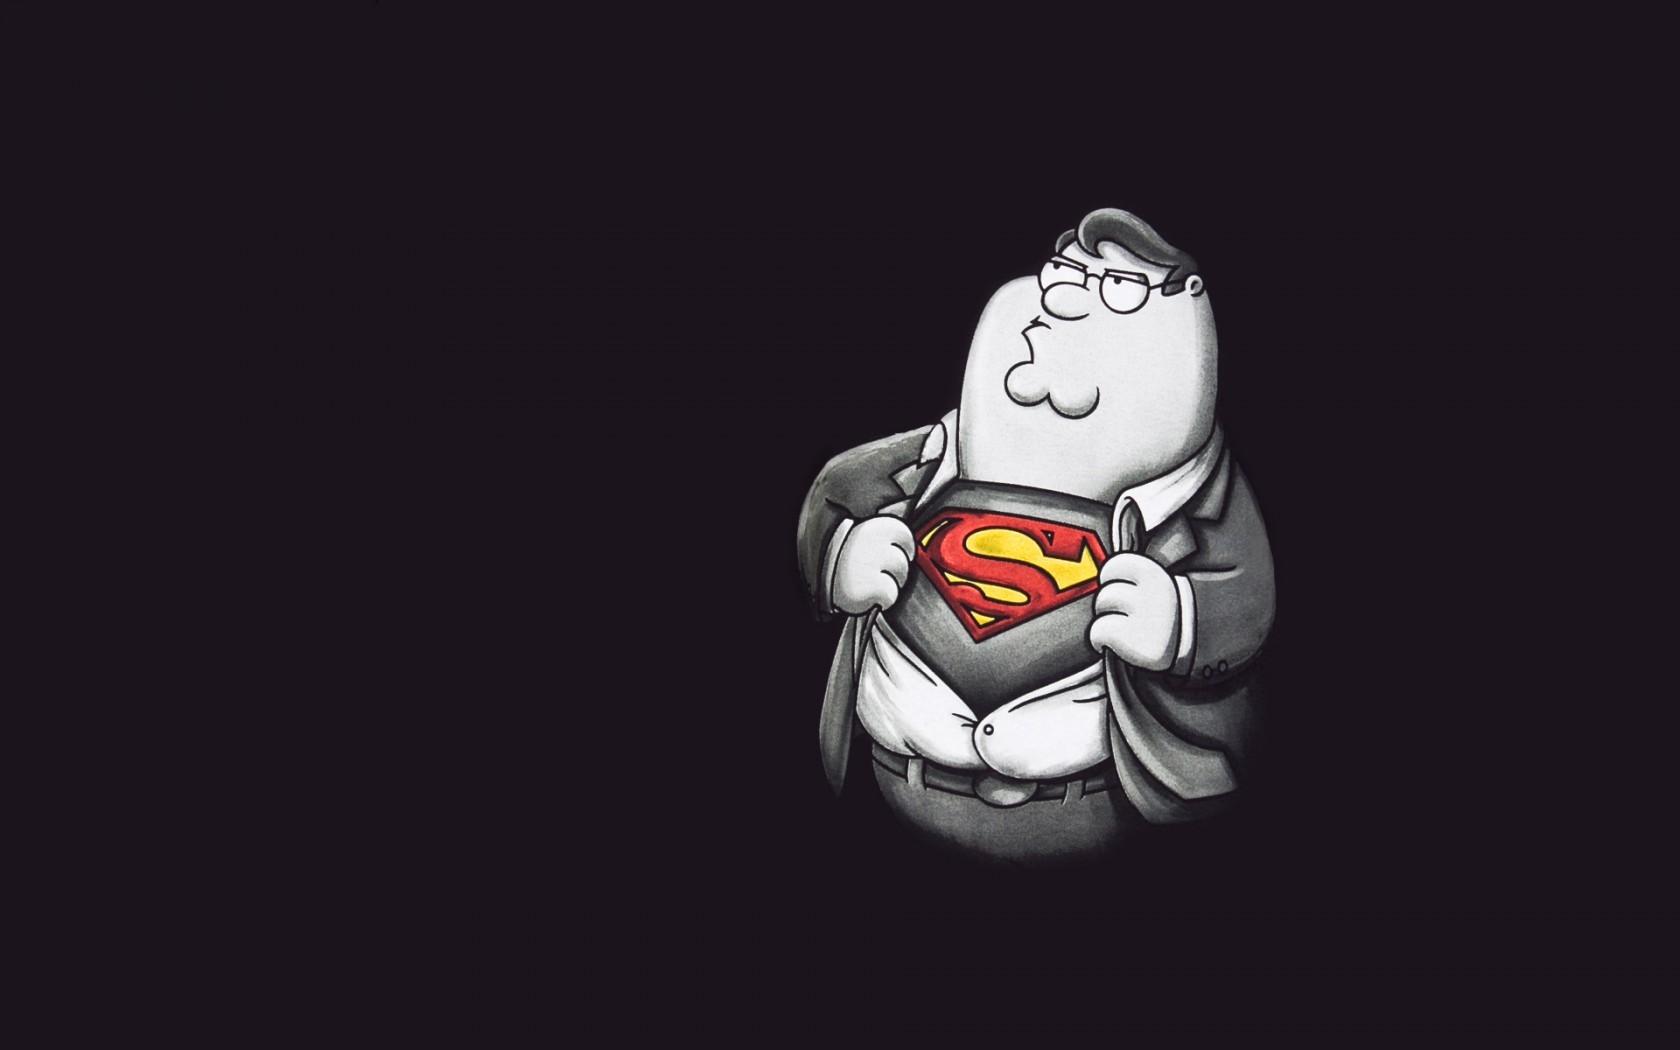 General 1680x1050 minimalism artwork superhero Peter Griffin gray